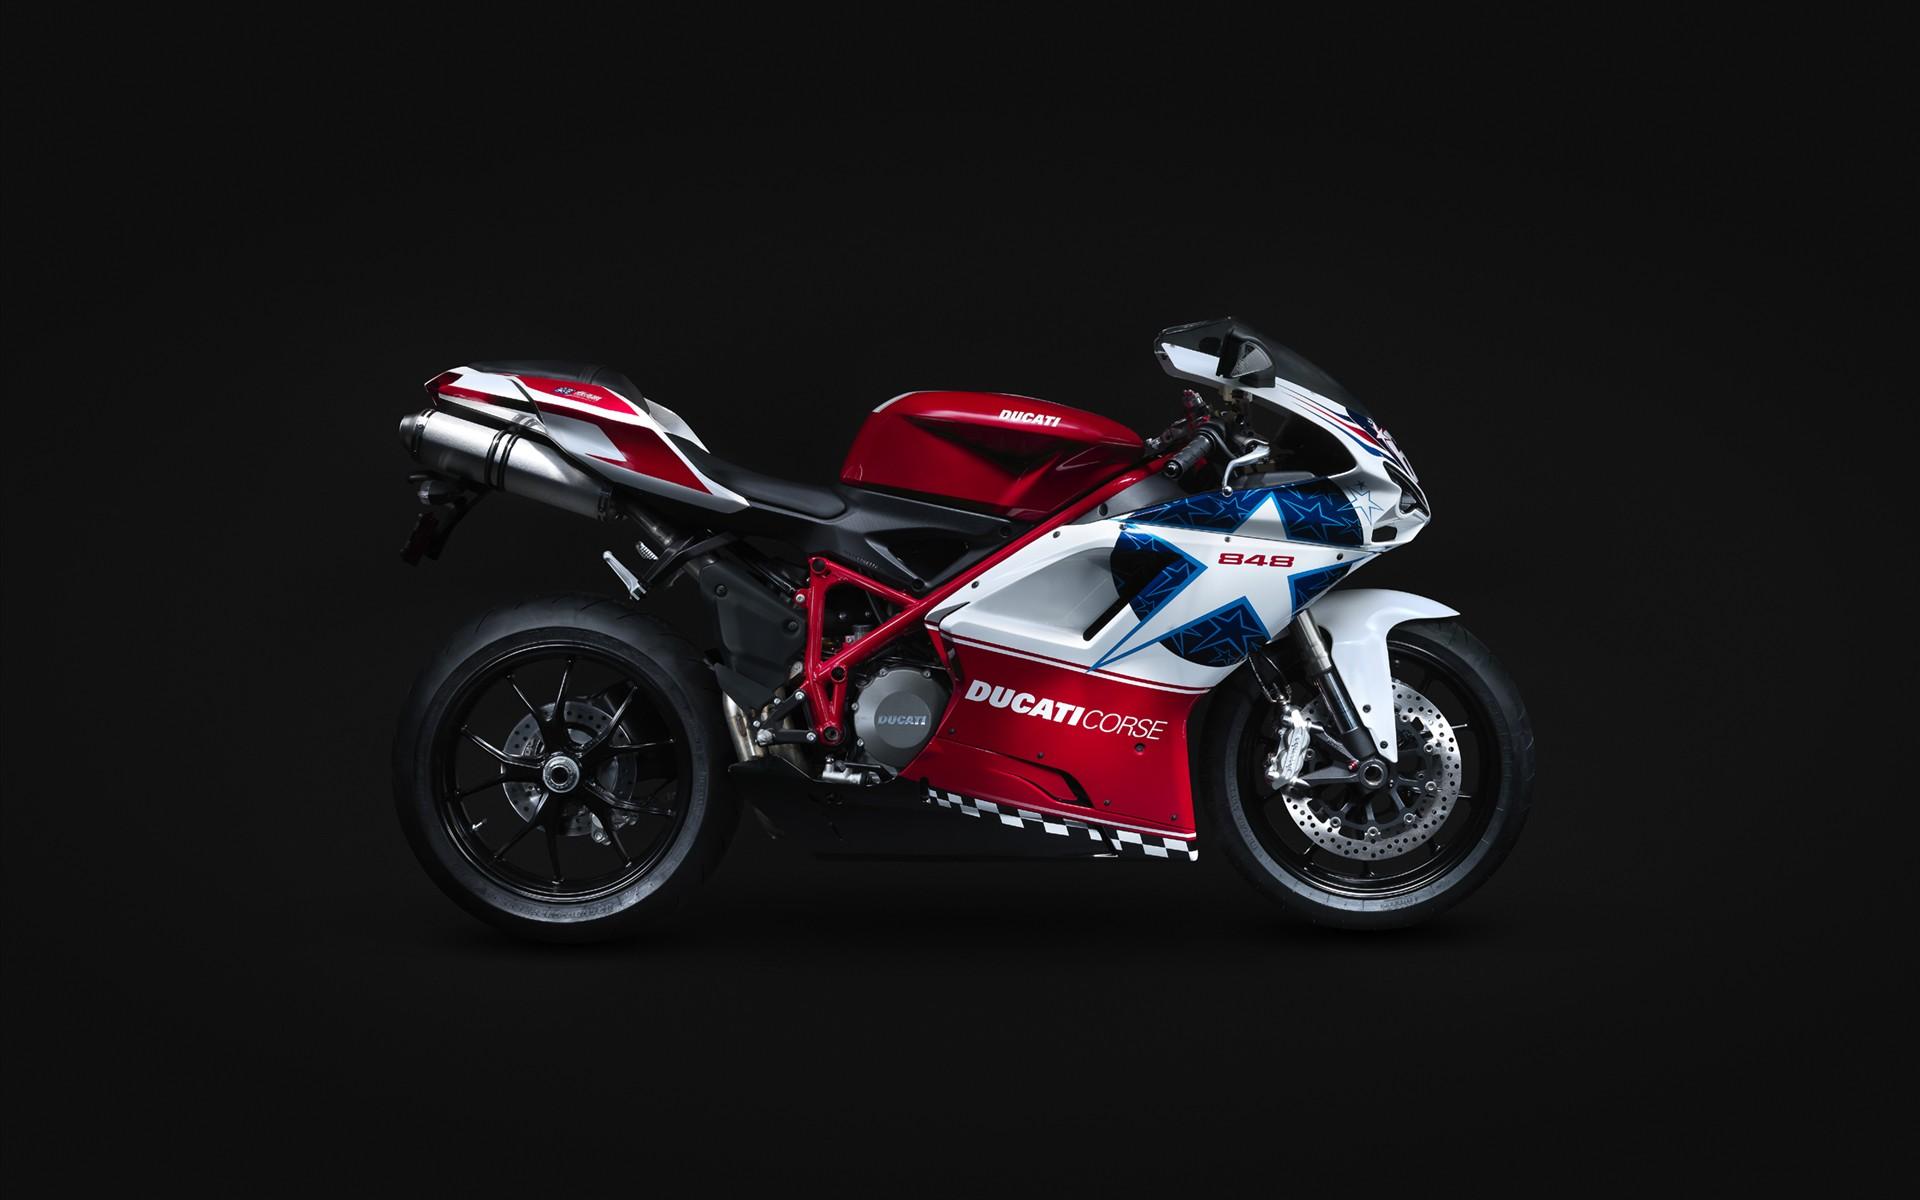 Ducati 848 Widescreen Wallpapers HD Wallpapers 1920x1200